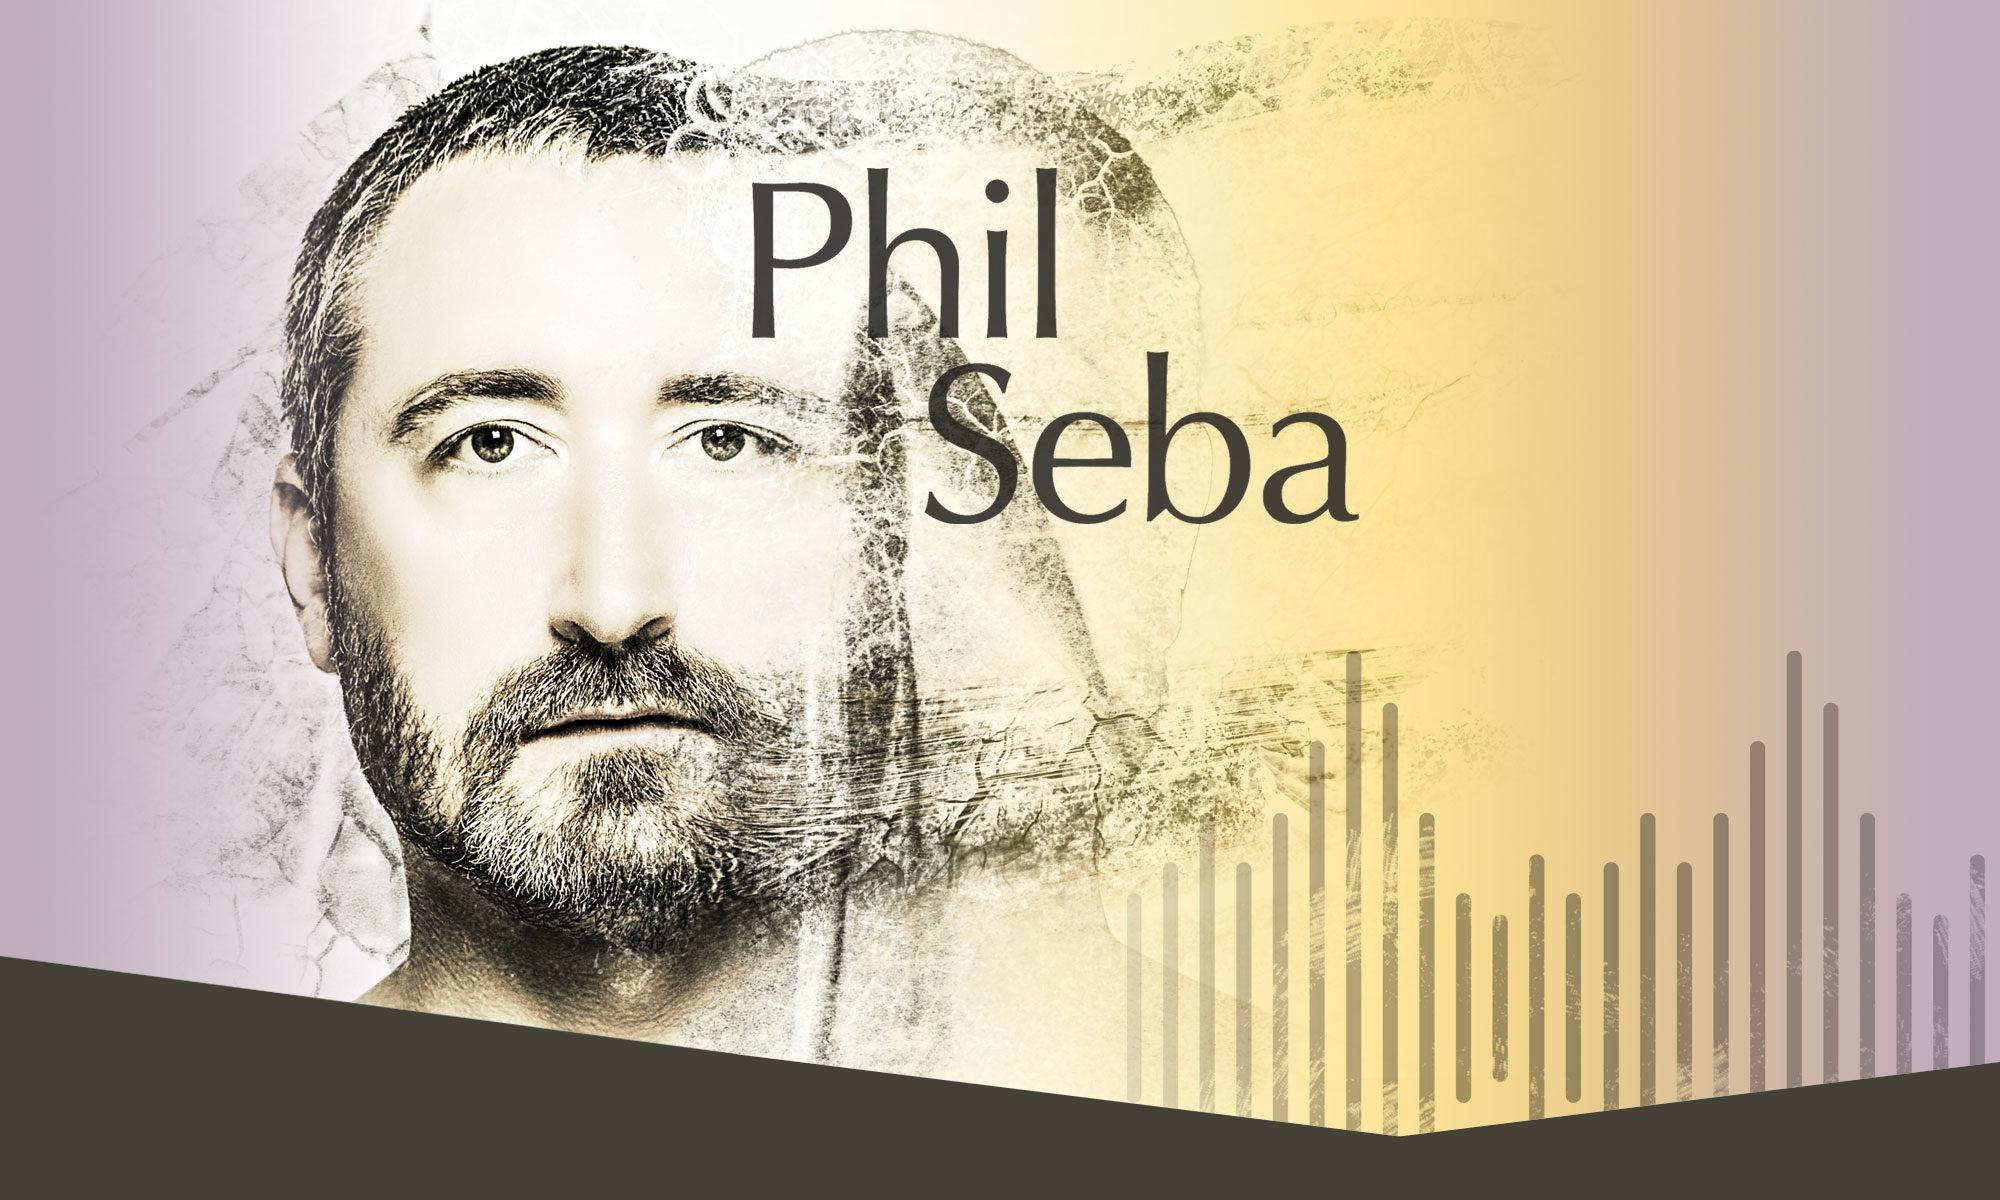 Phil Seba